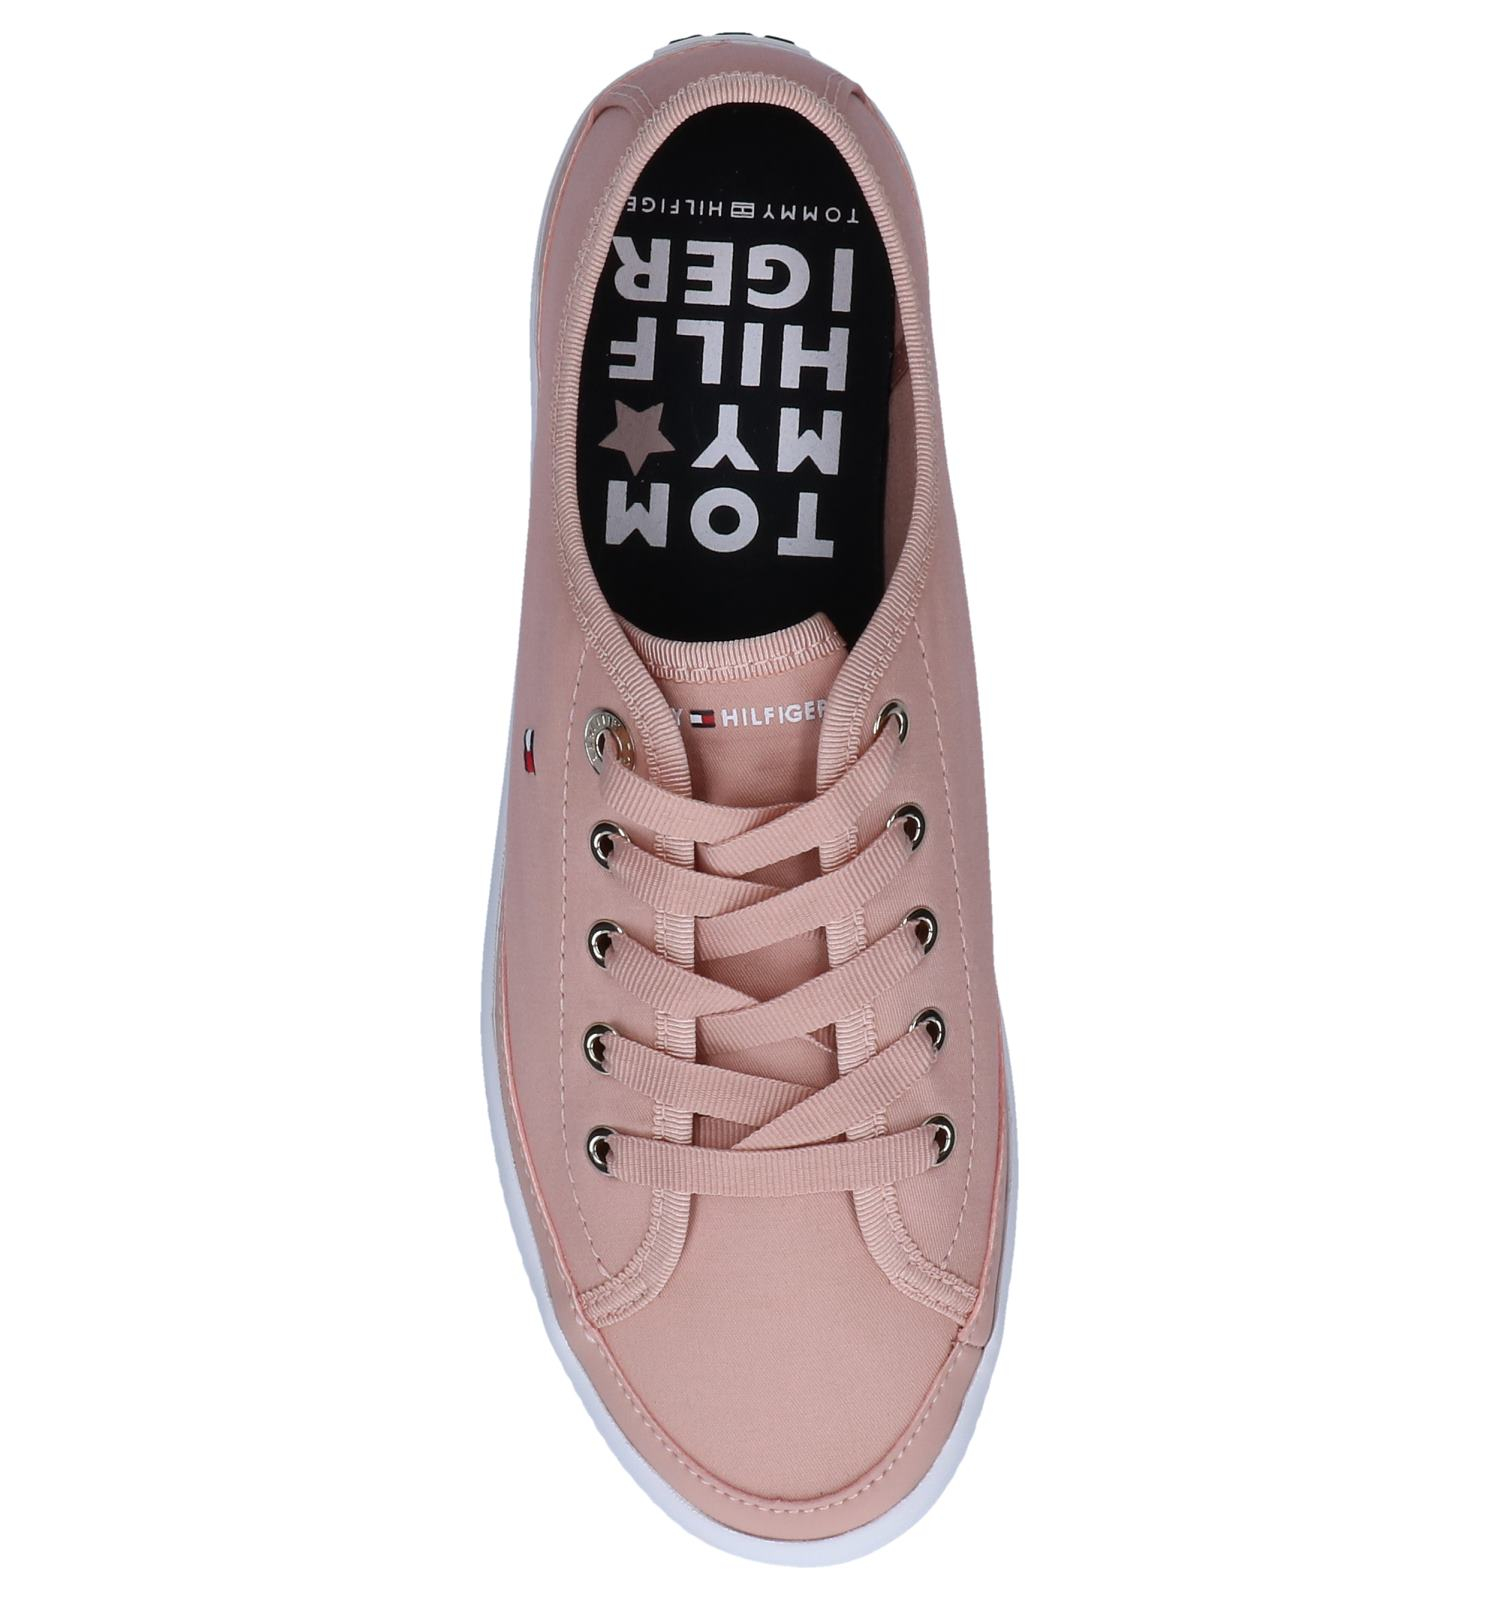 Tommy Hilfiger Sneakers Flatform Roze Corporate 5Aj34RLq